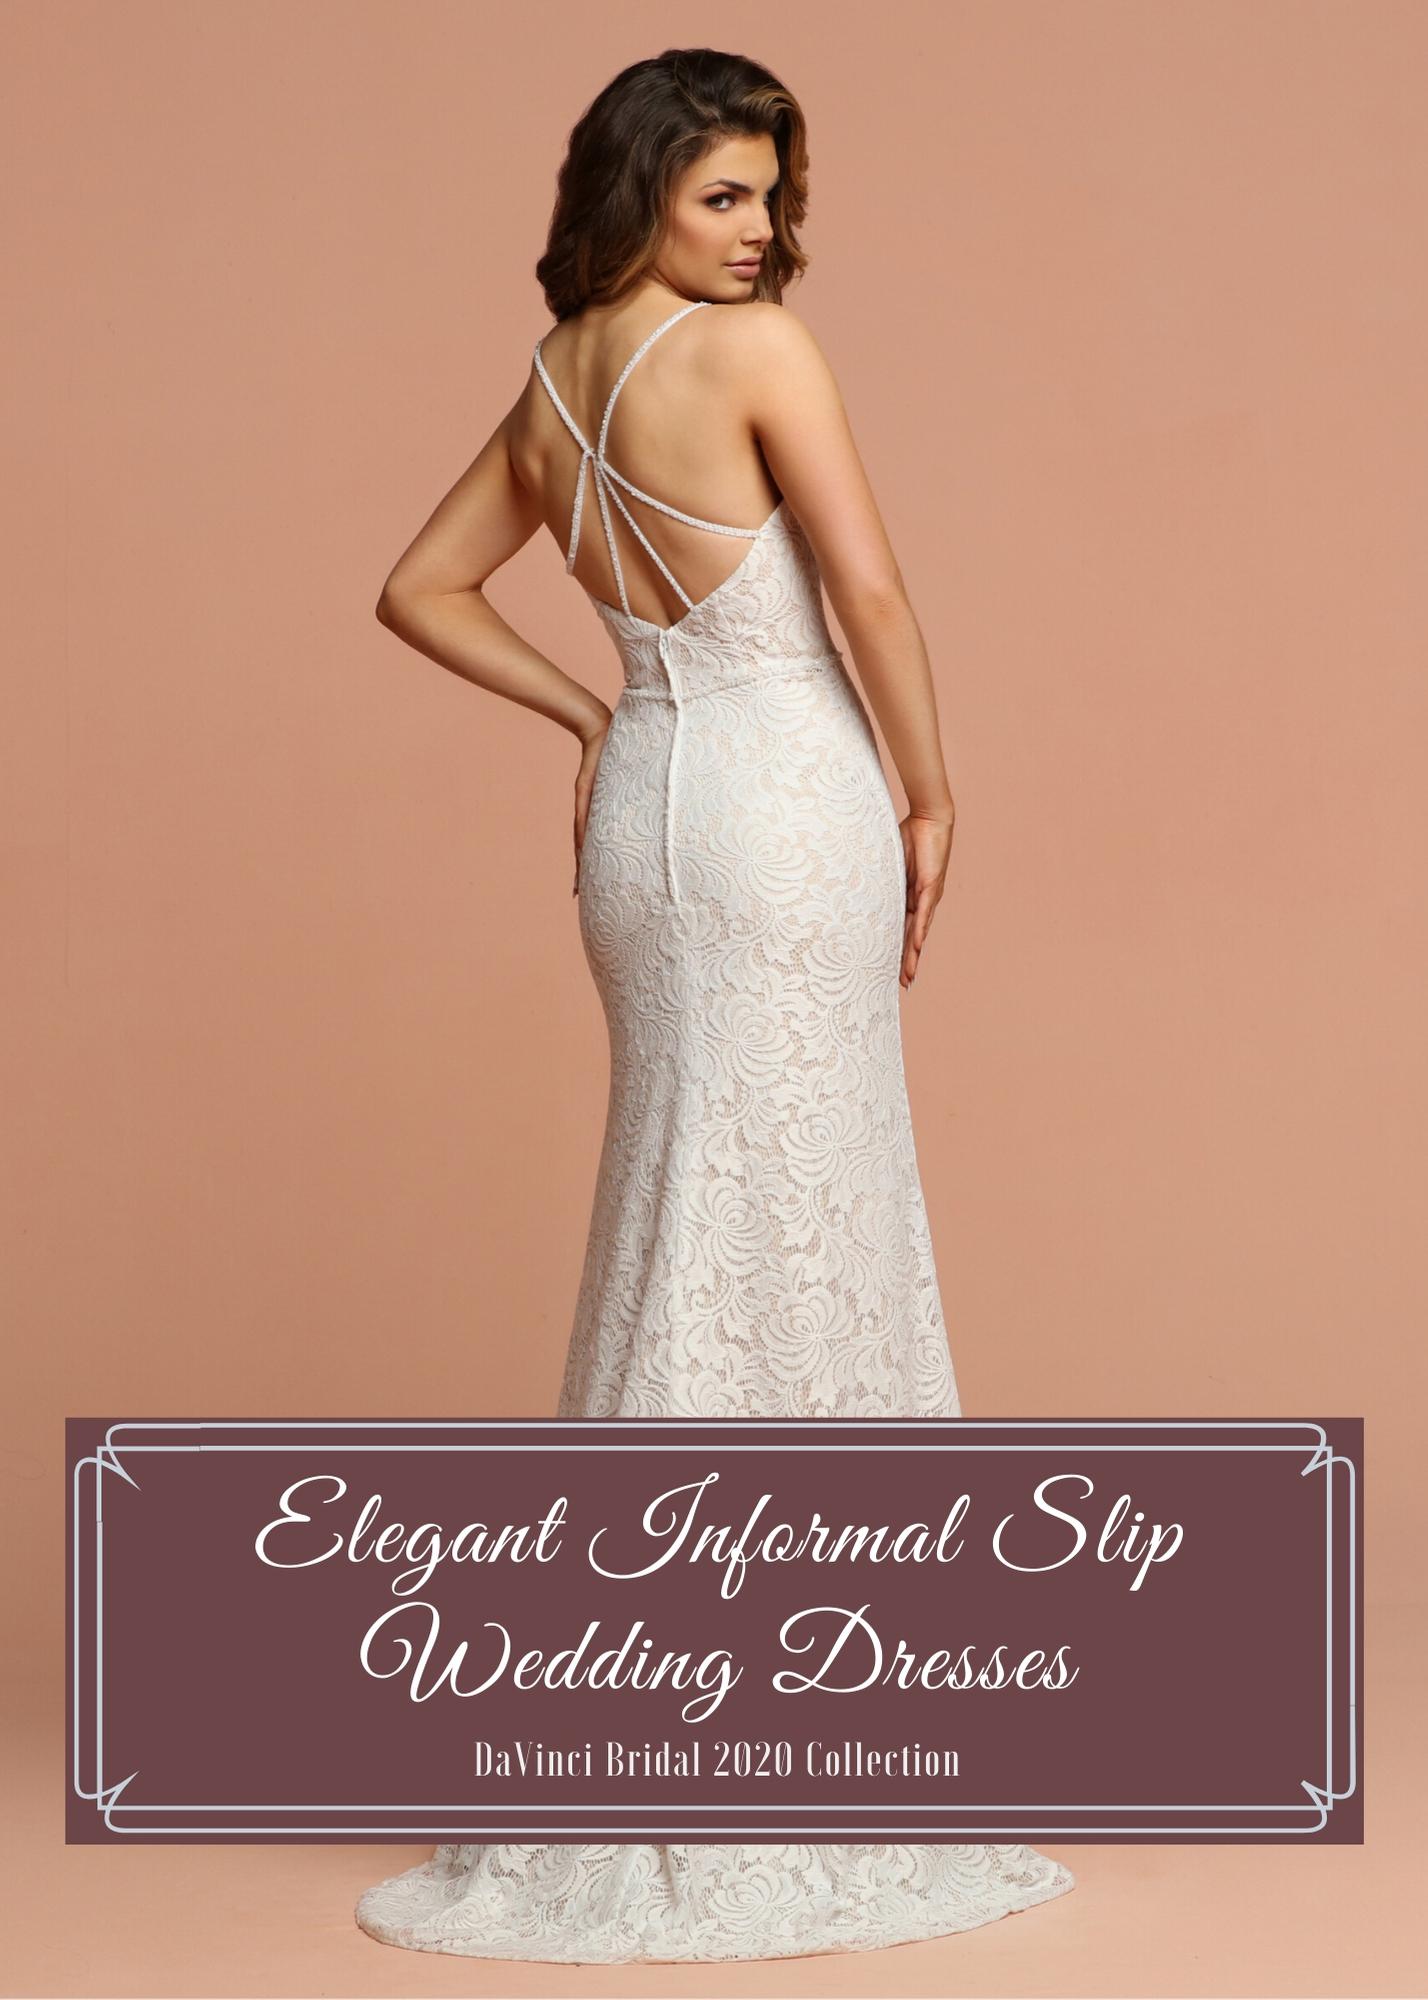 Informal Destination Beach Slip Wedding Dresses 2020 Davinci Bridal,Wedding Day Jennifer Lawrence Wedding Dress Dior